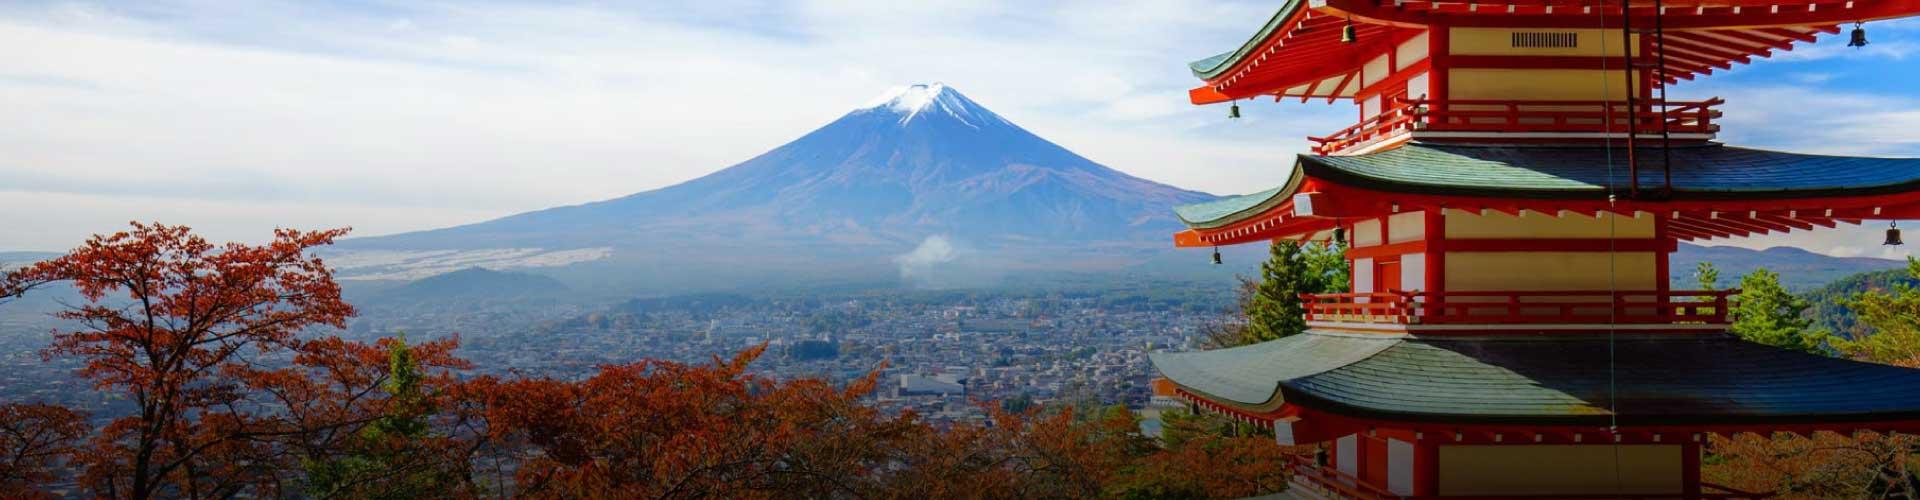 japon working holiday visa